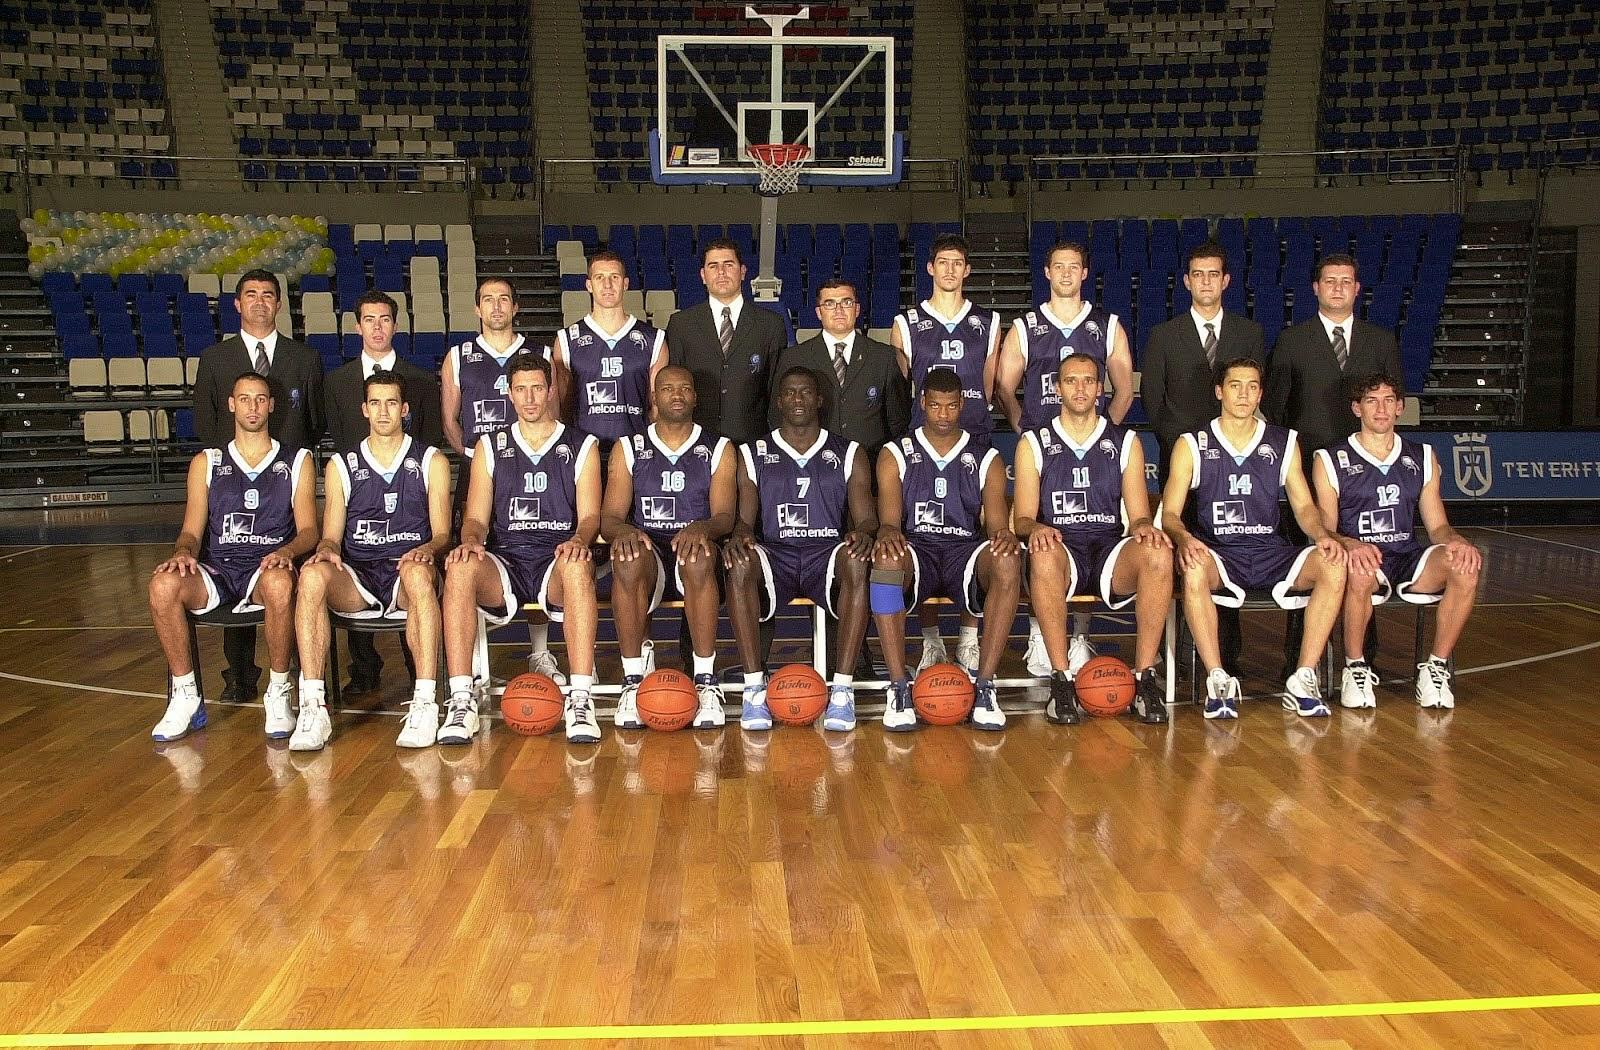 C.B. TENERIFE 2002-2003. Liga LEB